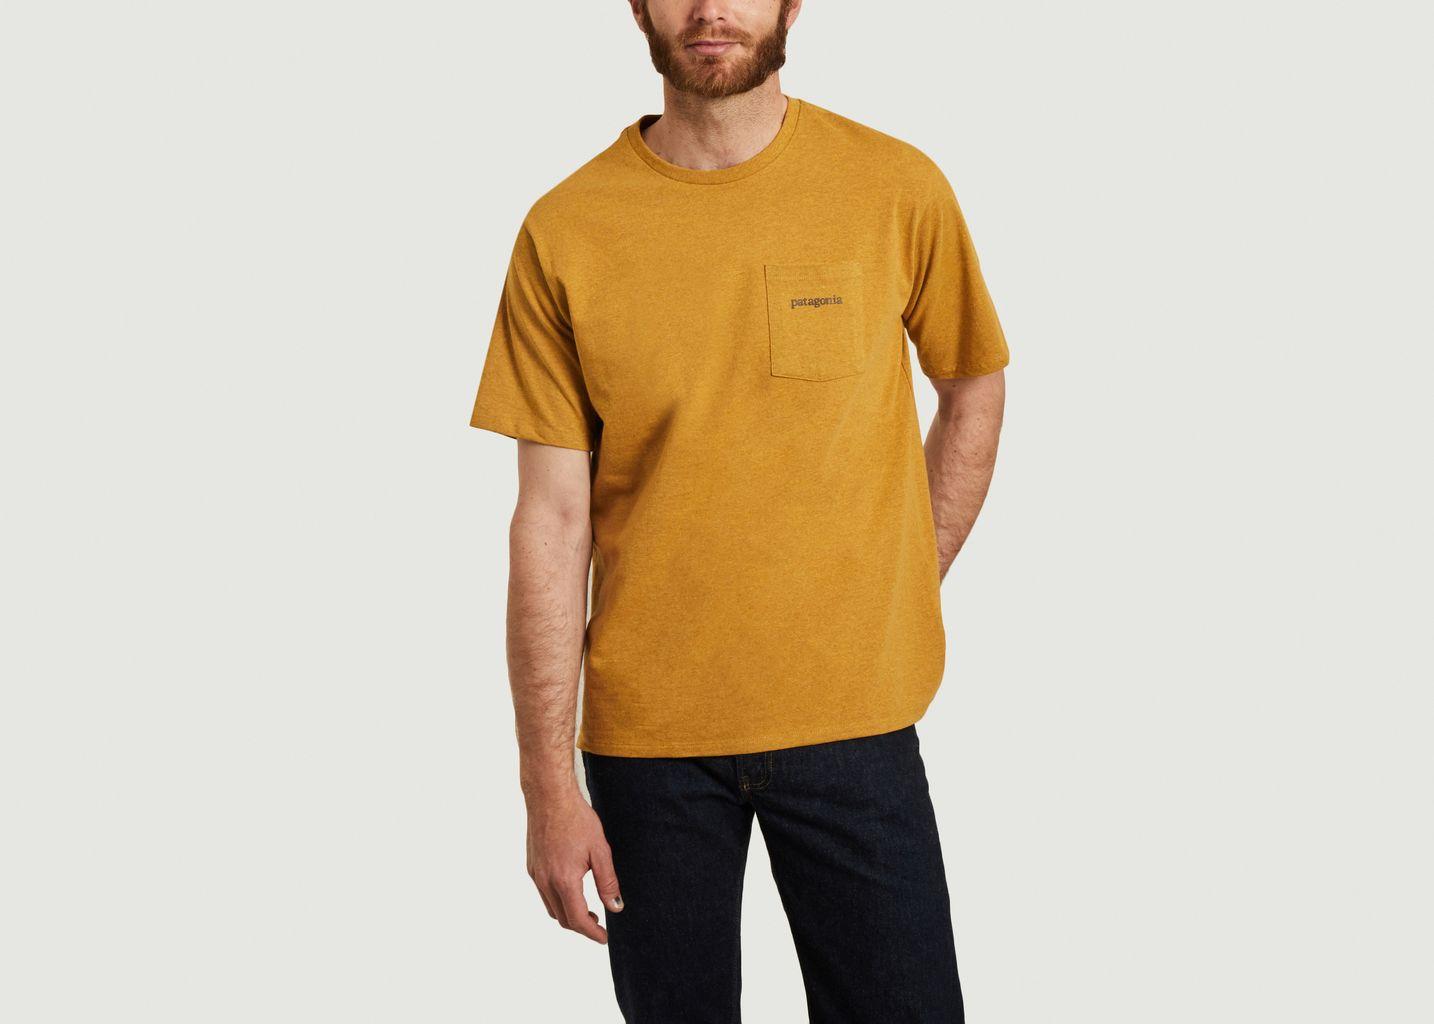 T-shirt P-6 Responsibili-tee - Patagonia